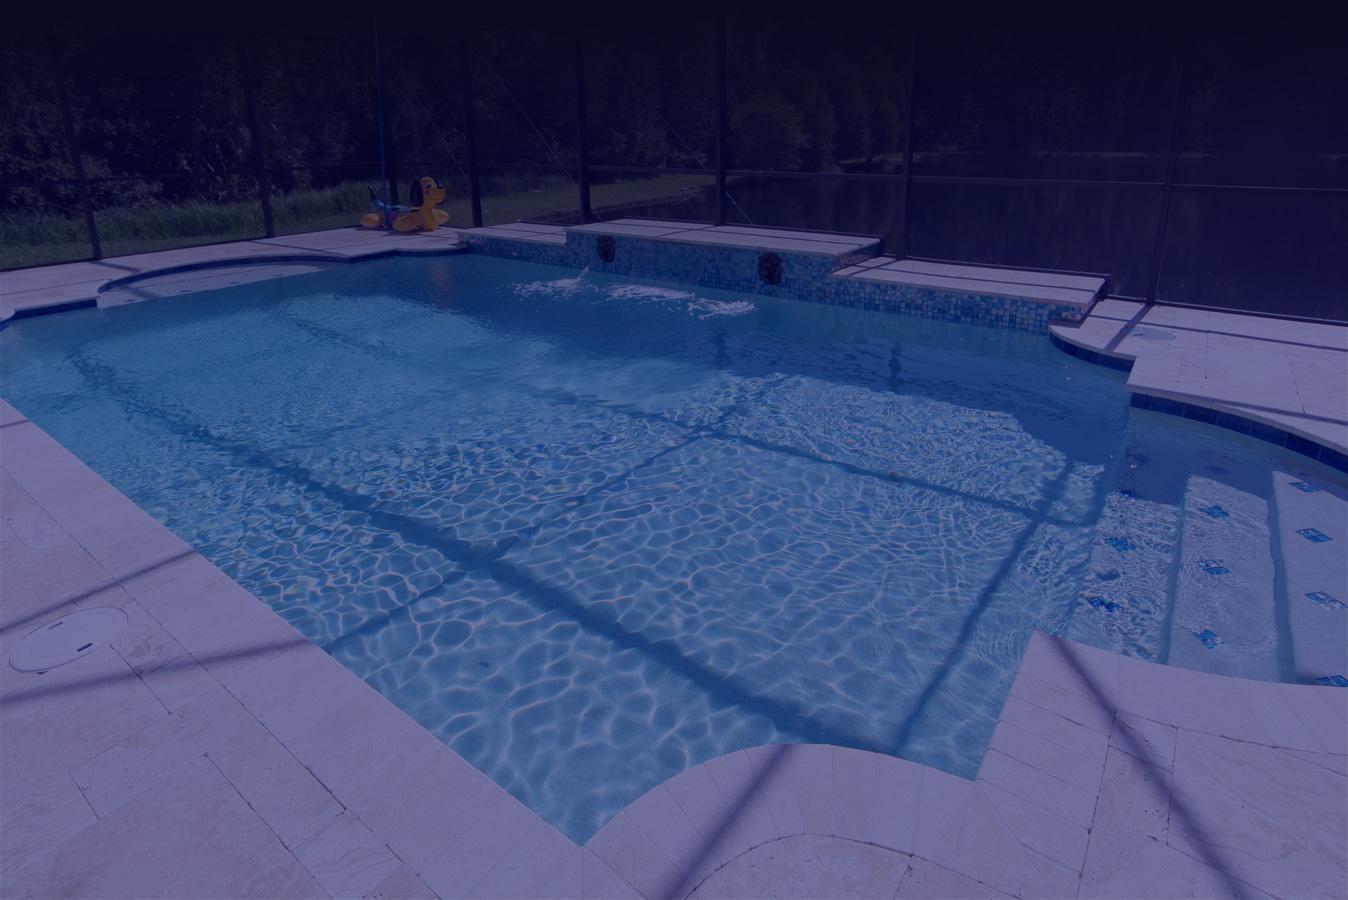 South Miami Dade Pool Maintenance